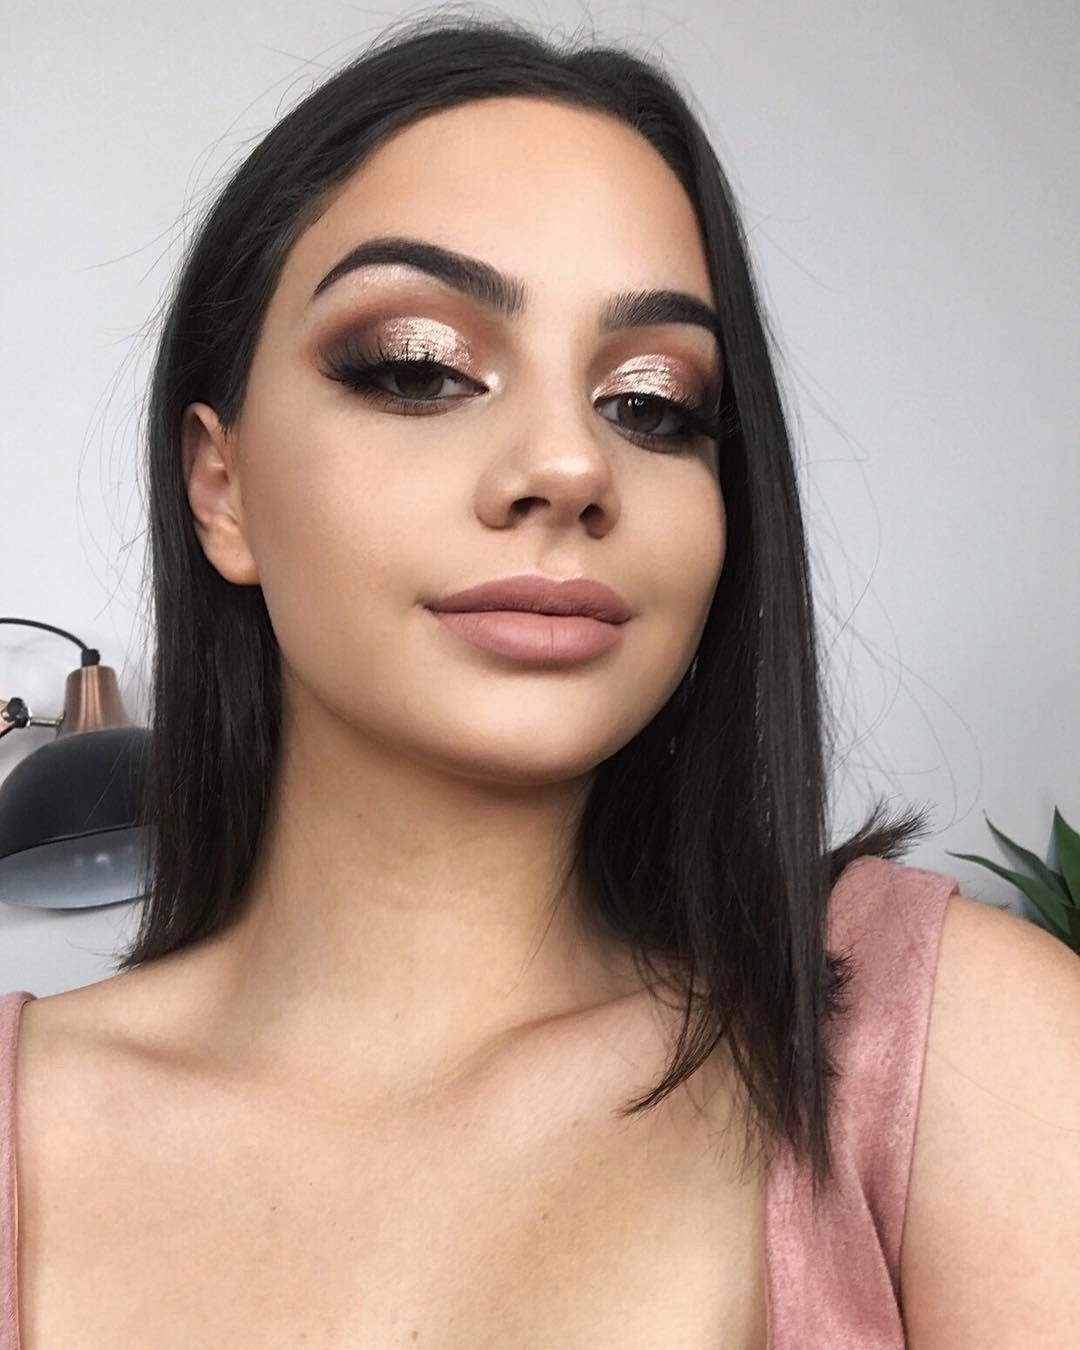 Goooood Morning Darlings I Just Uploaded A New Video To My Channel That U Don T Wanna Miss Heheh Rose Gold Eye Makeup Birthday Makeup Looks Black Dress Makeup [ 1350 x 1080 Pixel ]